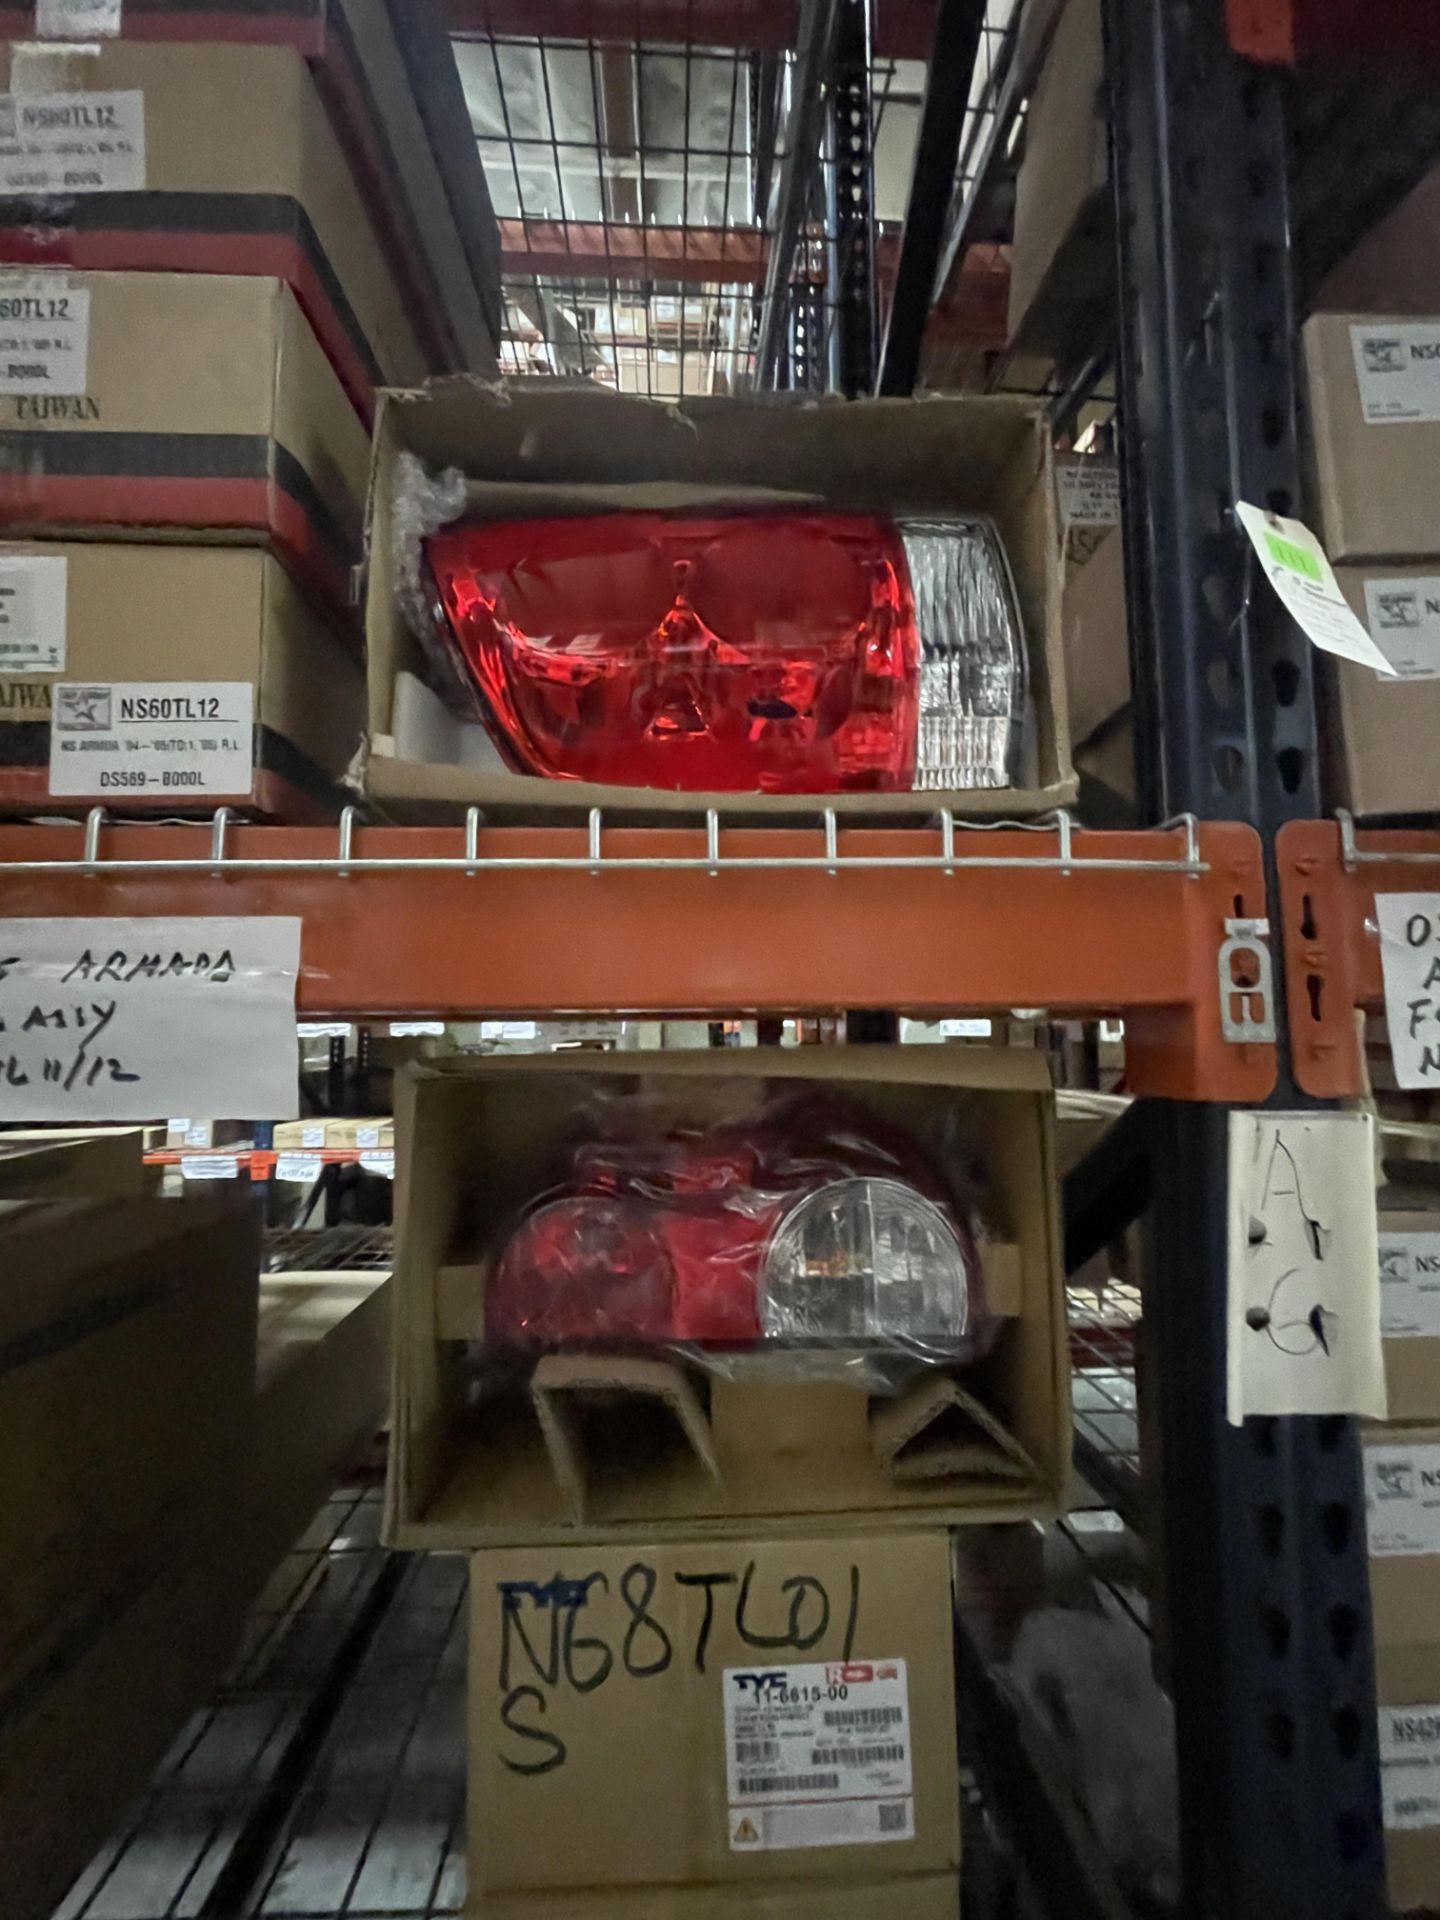 ASST EAGLE TYC AUTO LAMPS PATHFINDER ARMADA 46X - Image 3 of 3